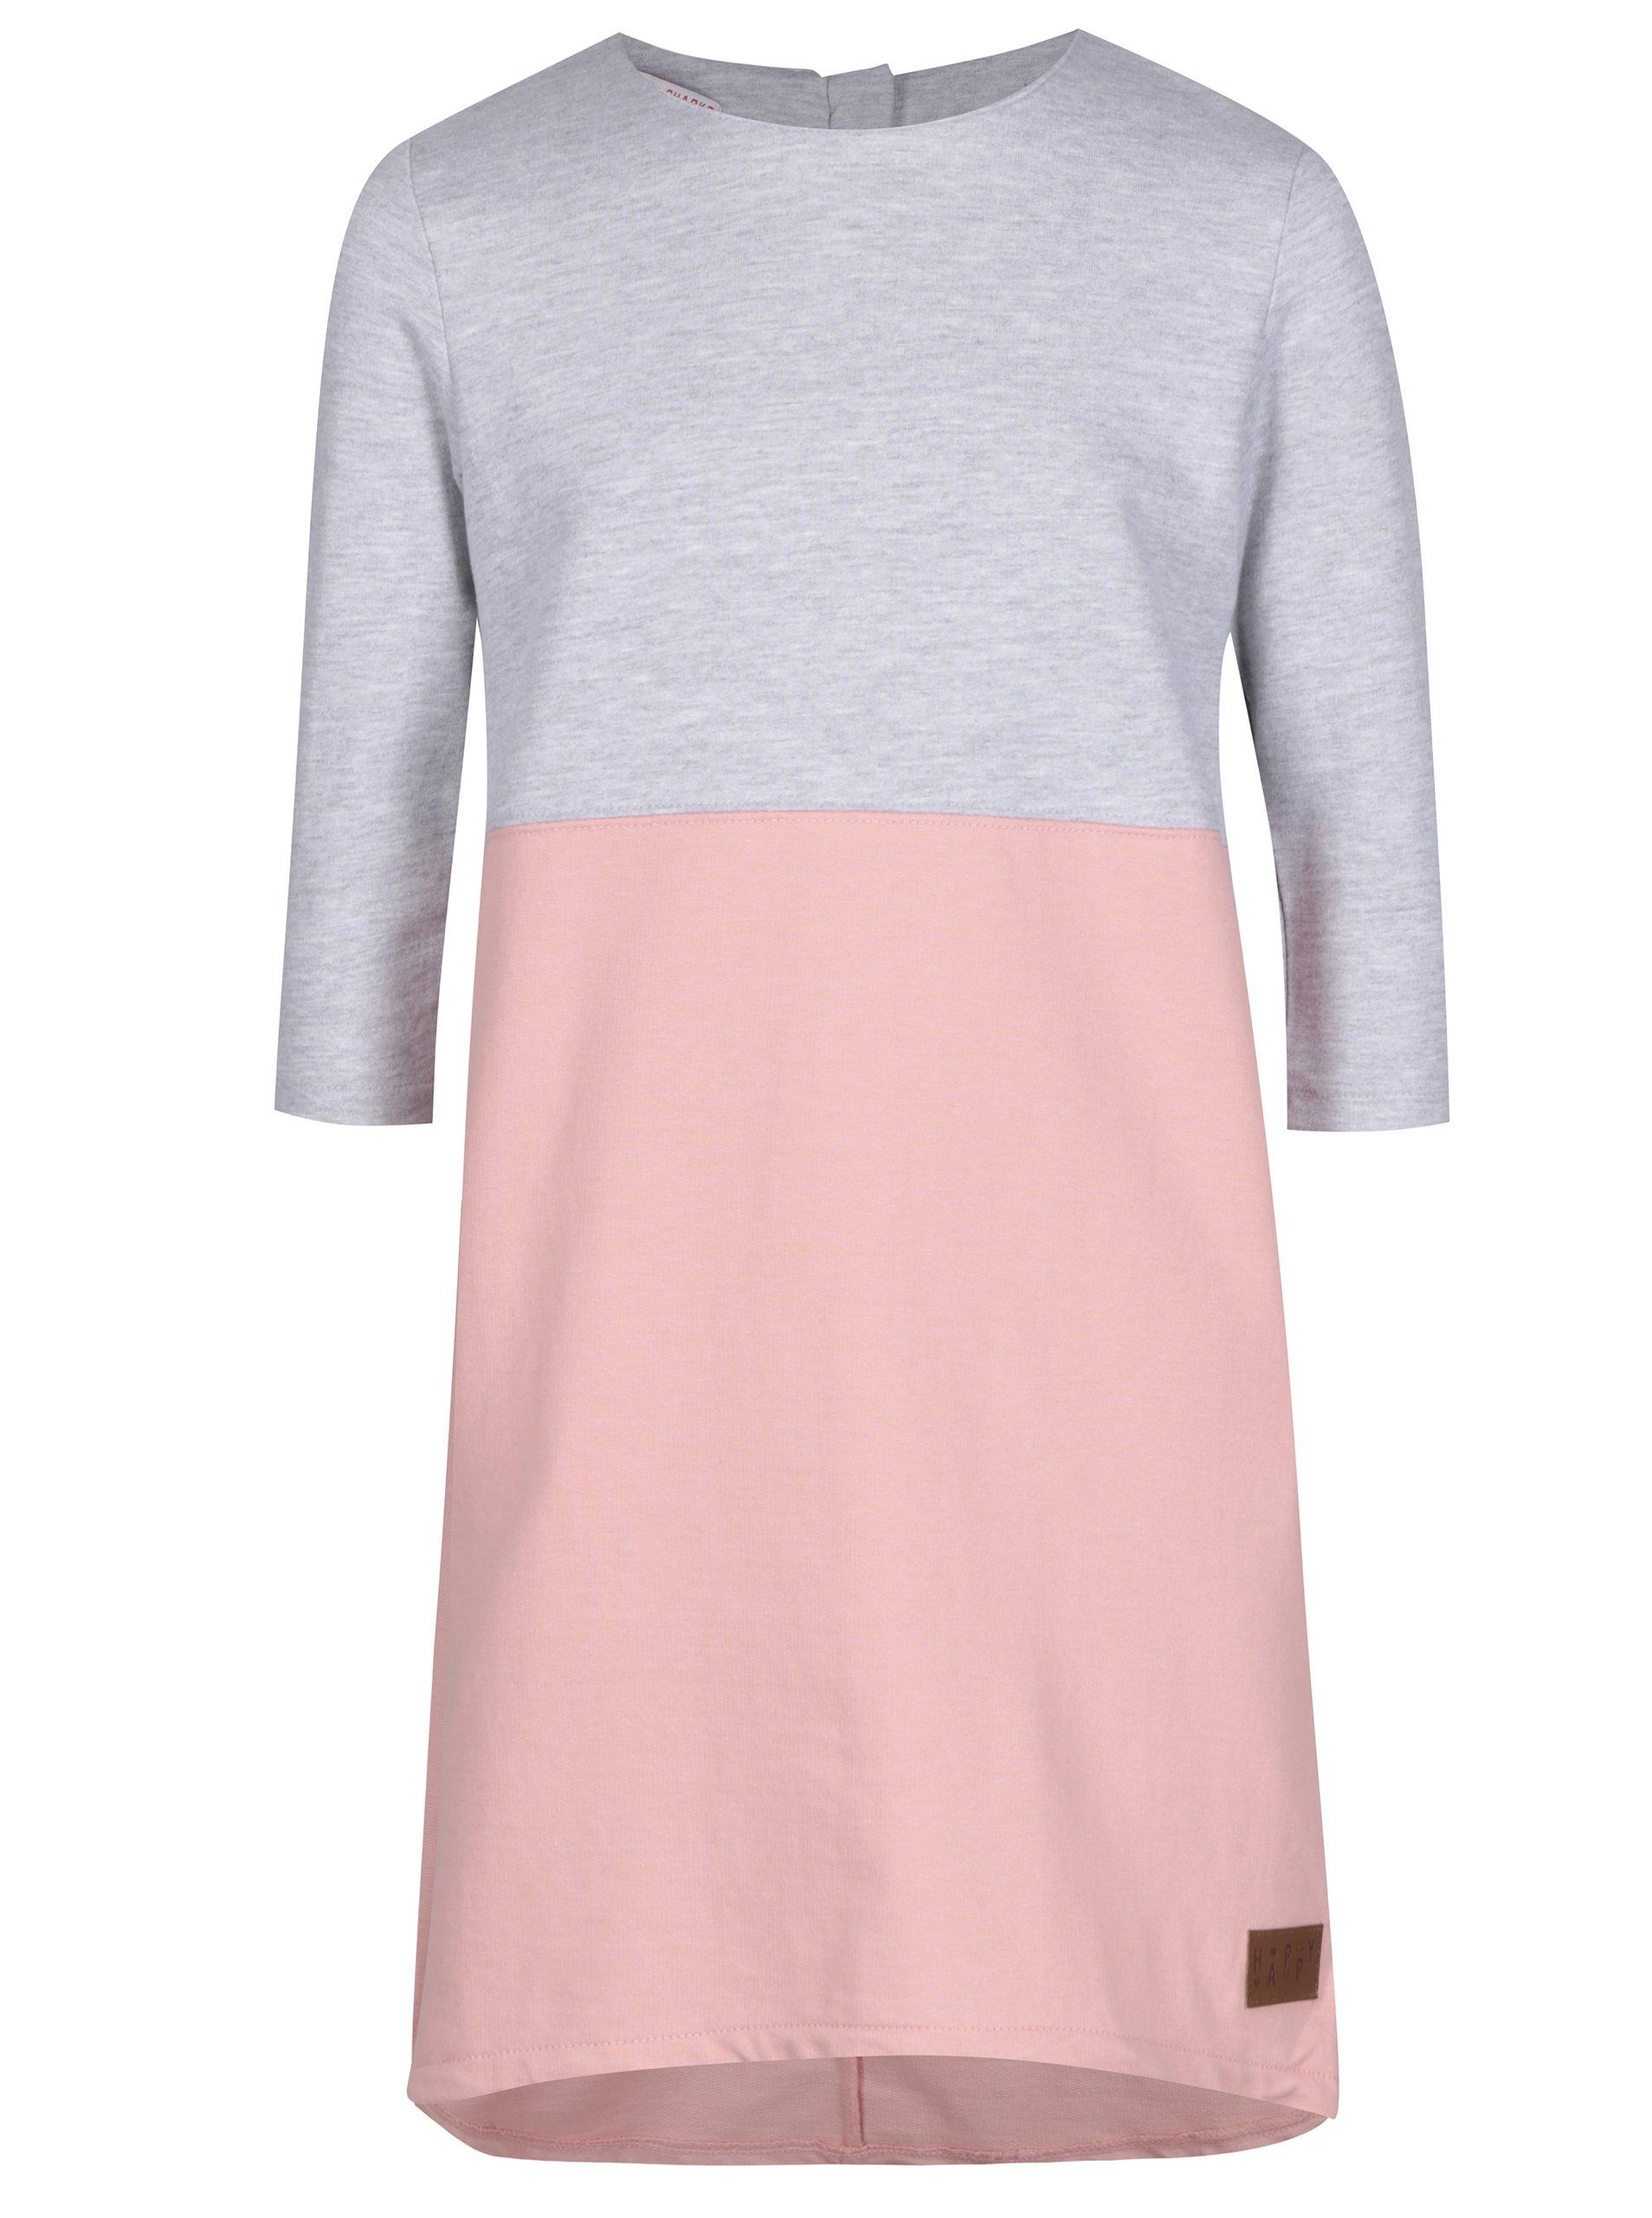 Šedo-růžové holčičí mikinové šaty 5.10.15.